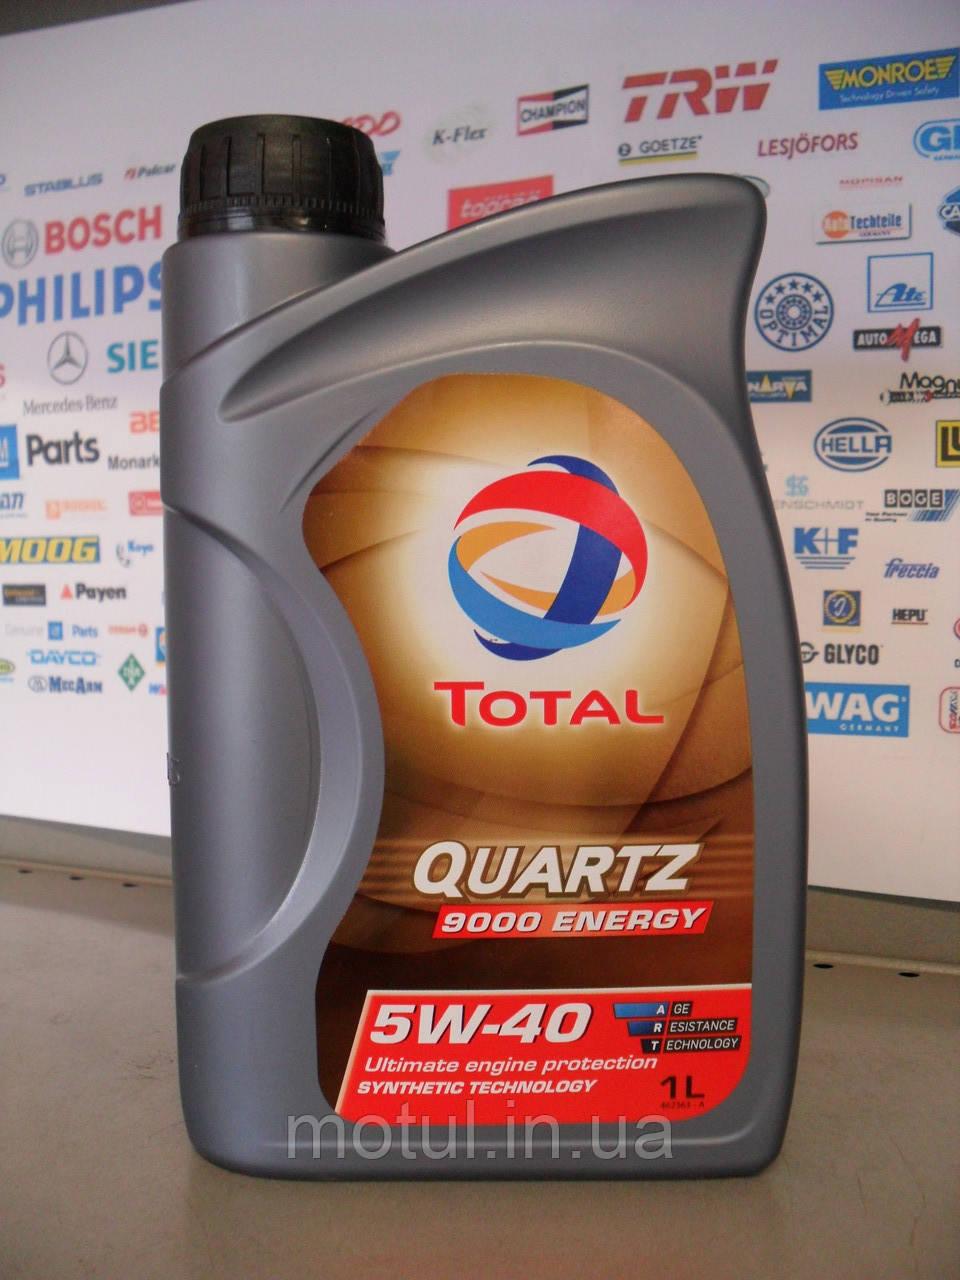 Моторне масло Total quartz energy 5w40 1л